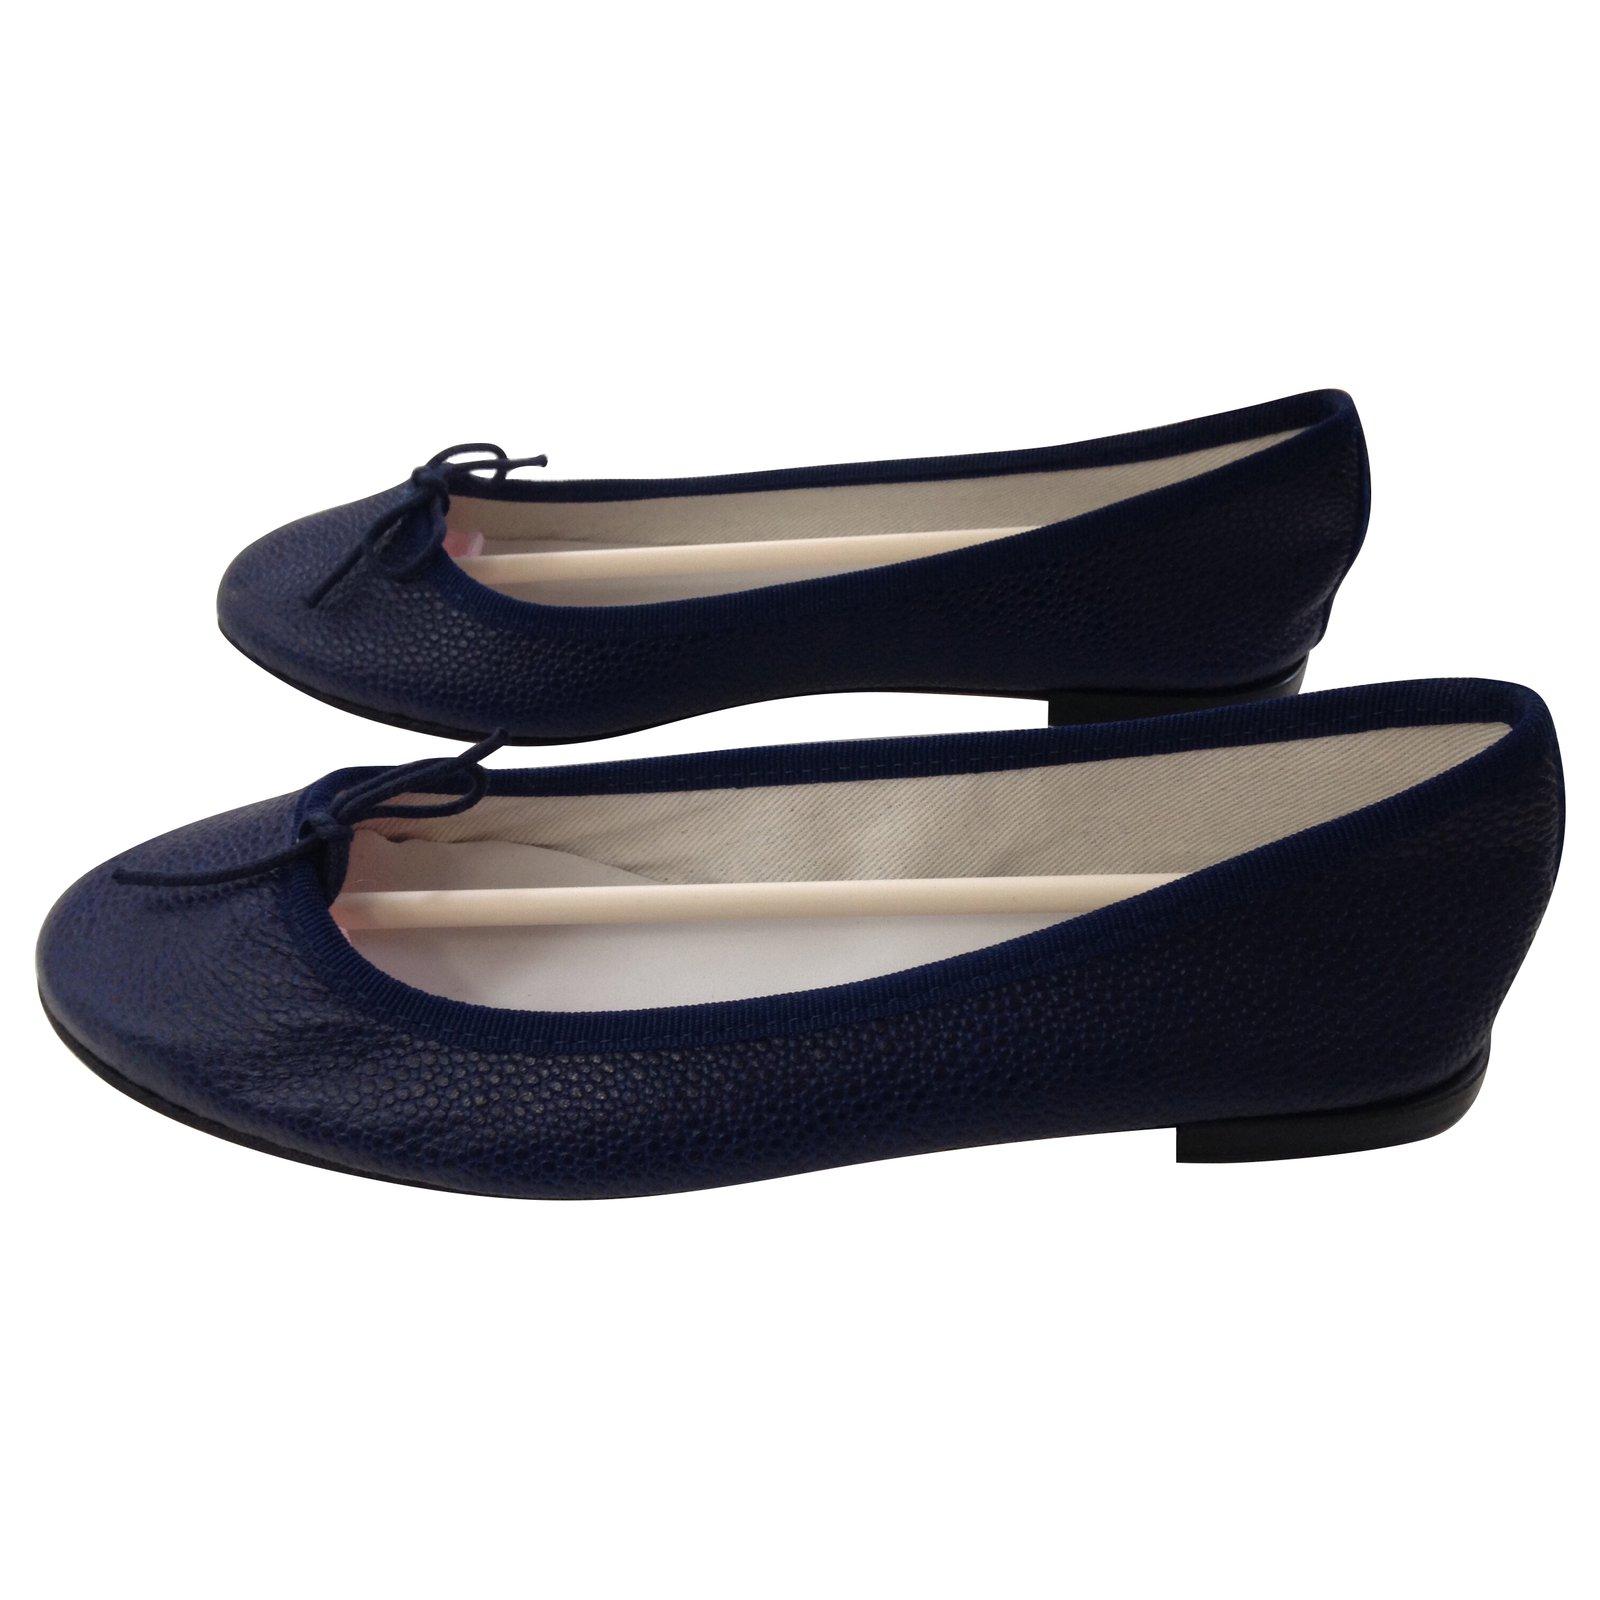 cd9722f94f83 Repetto Ballet flats Ballet flats Leather Navy blue ref.73118 - Joli ...